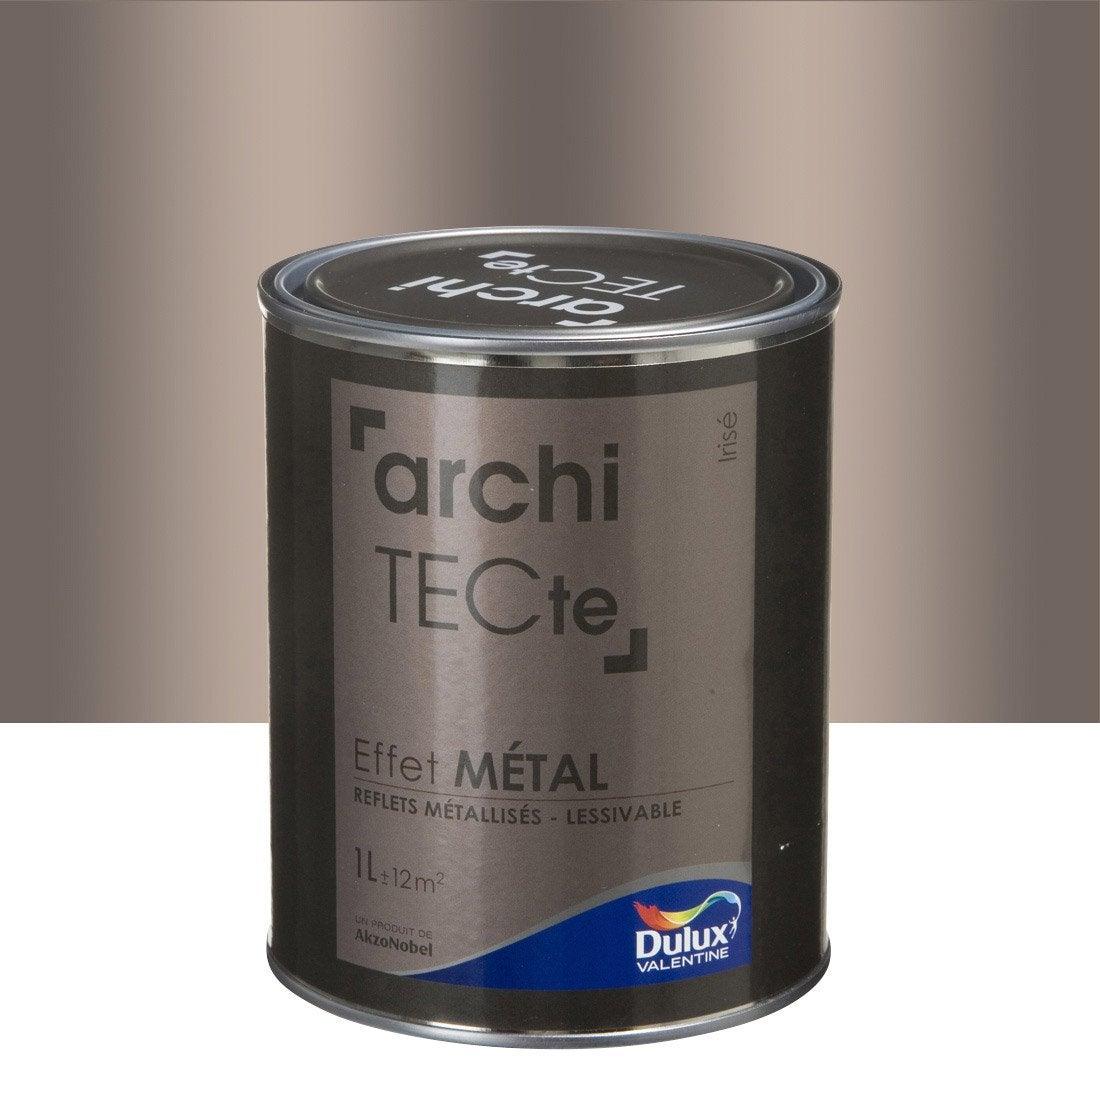 Peinture effet architecte effet m tal dulux valentine beige iris 1 l - Peinture effet metal ...